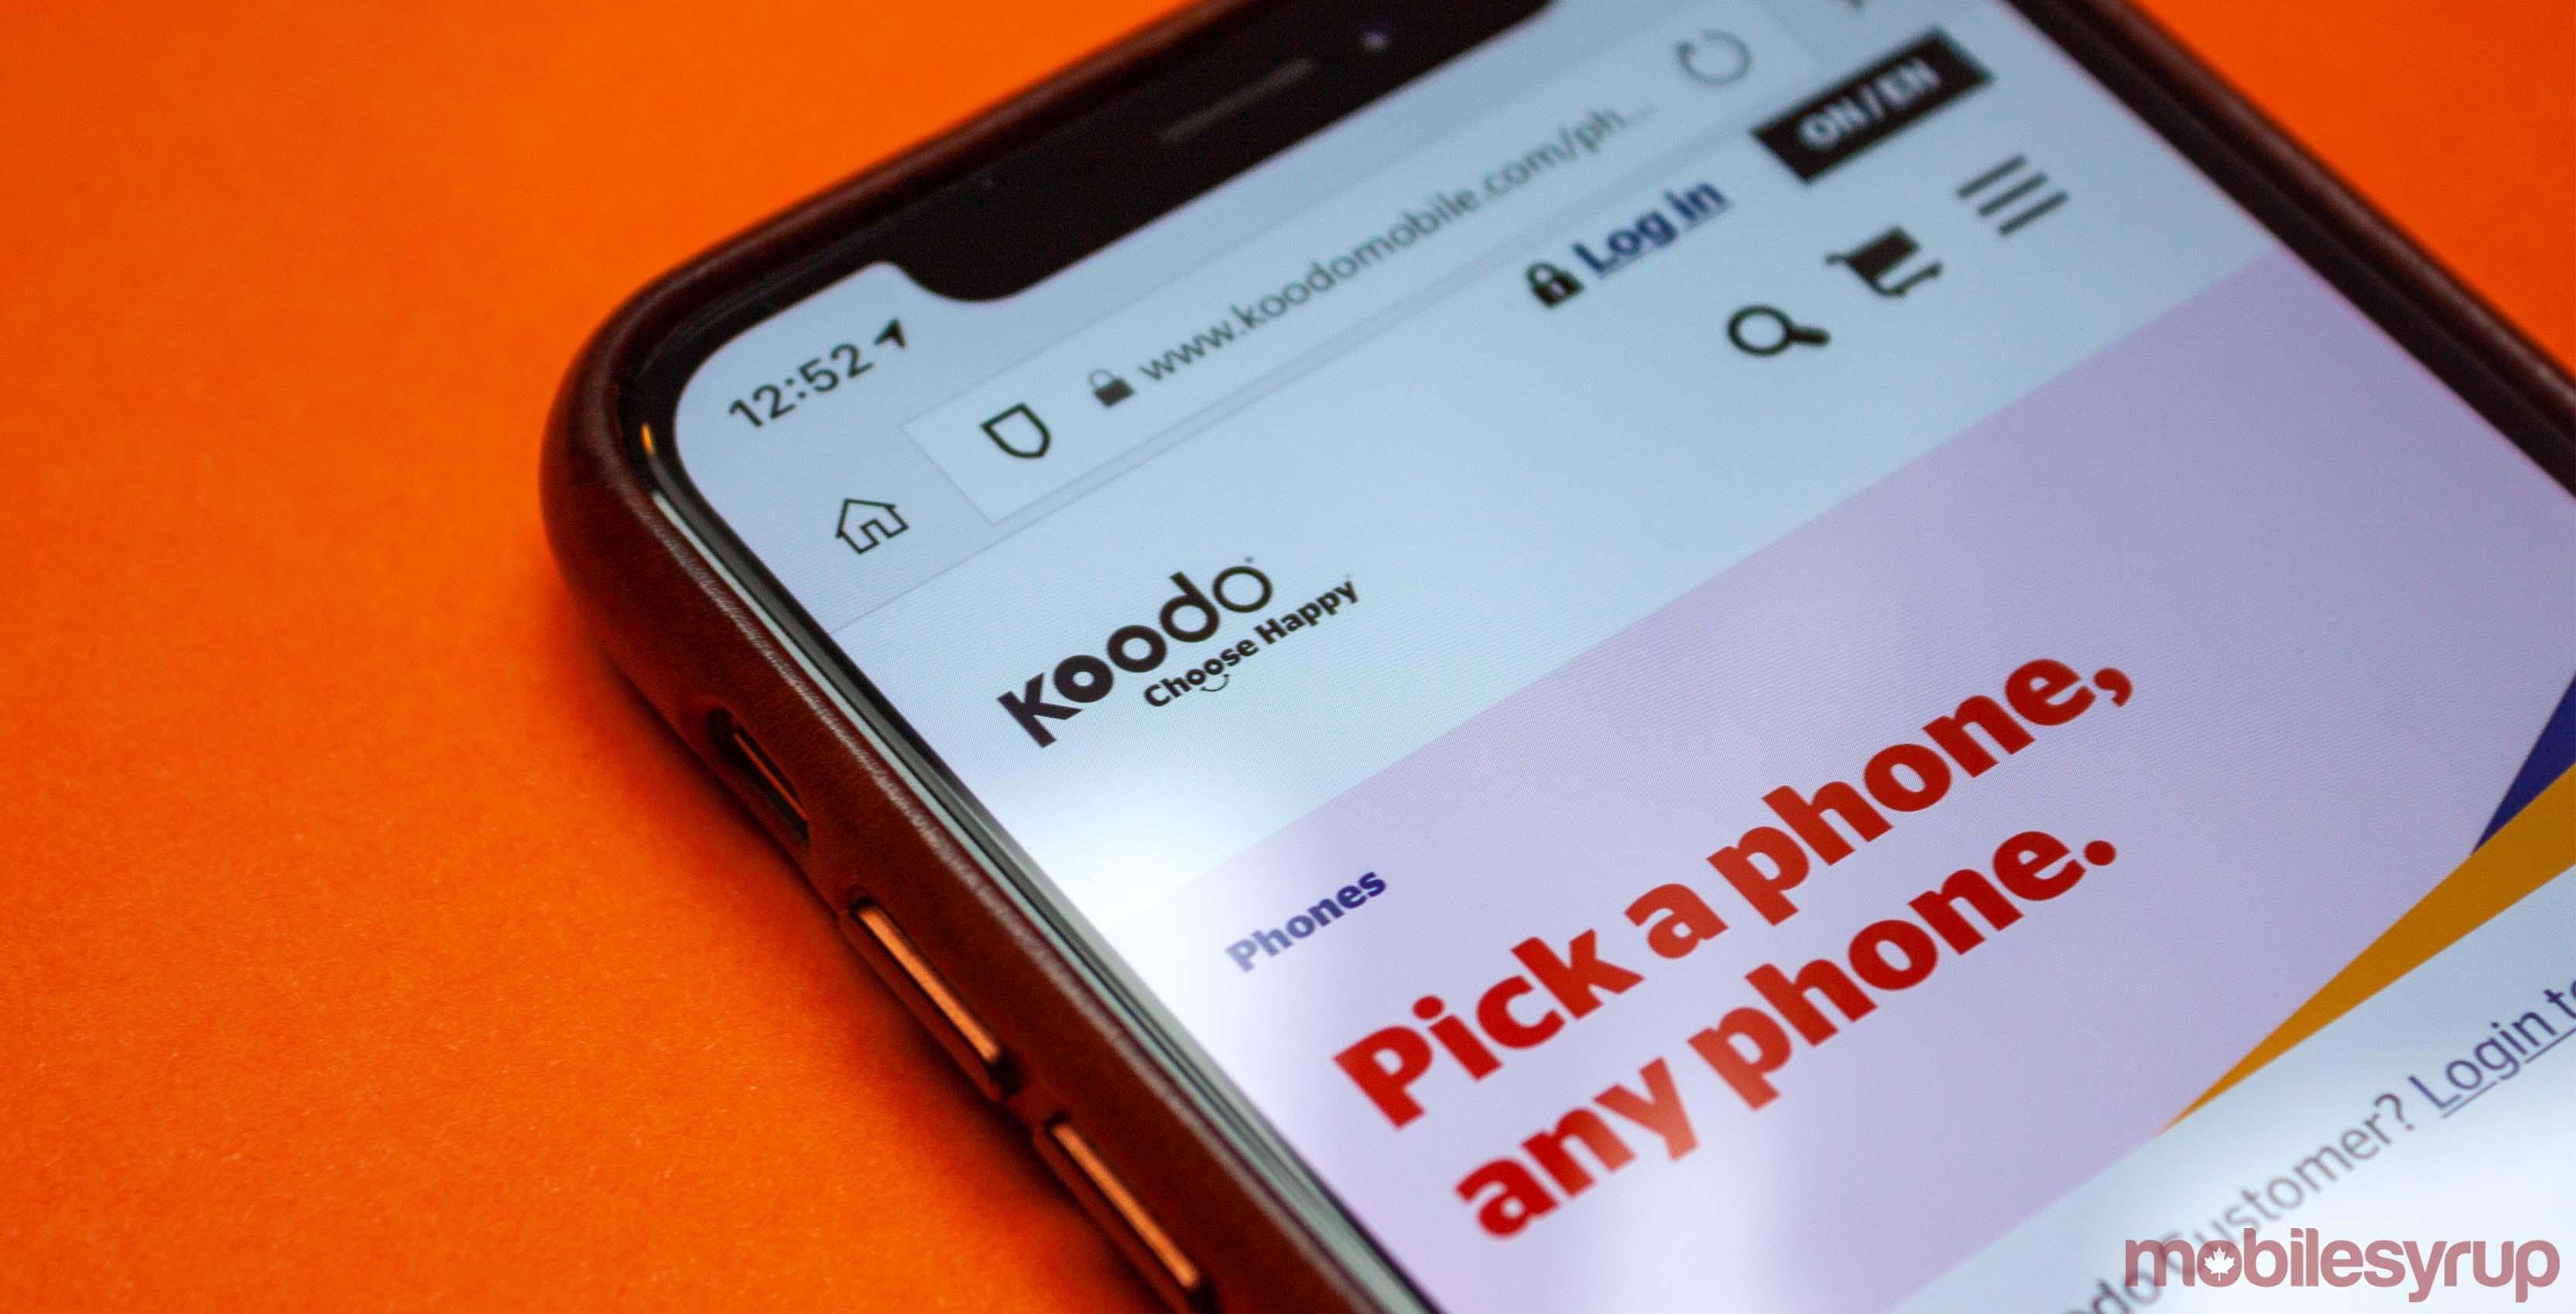 Koodo website on iPhone